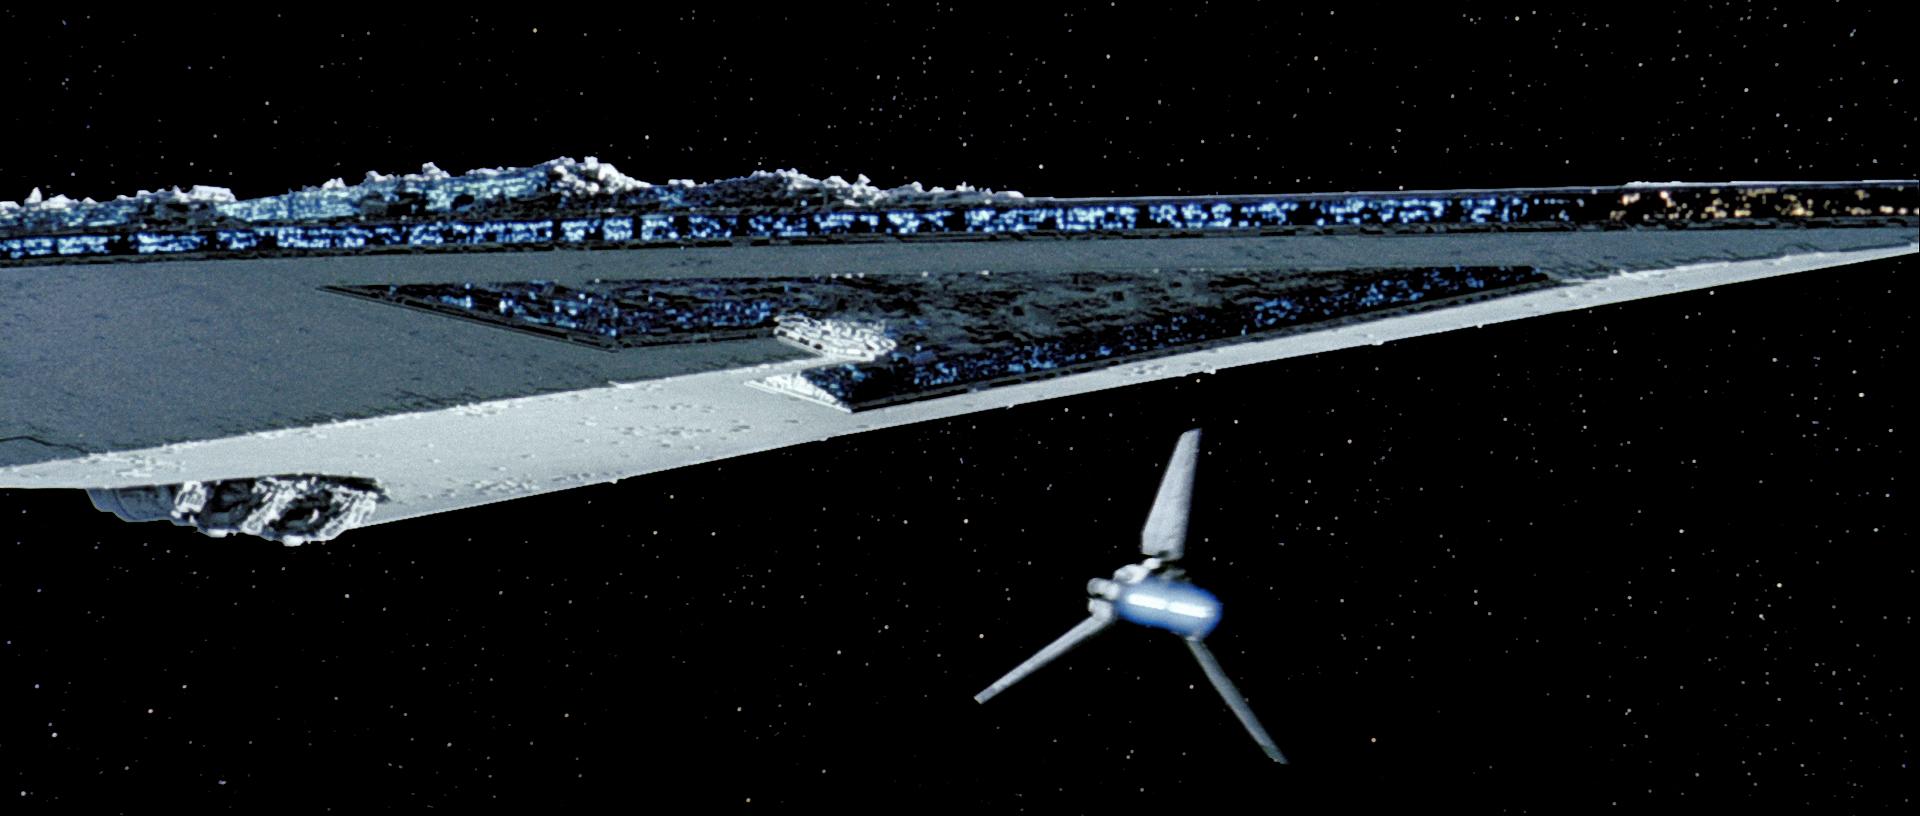 Executor-class Star Destroyer